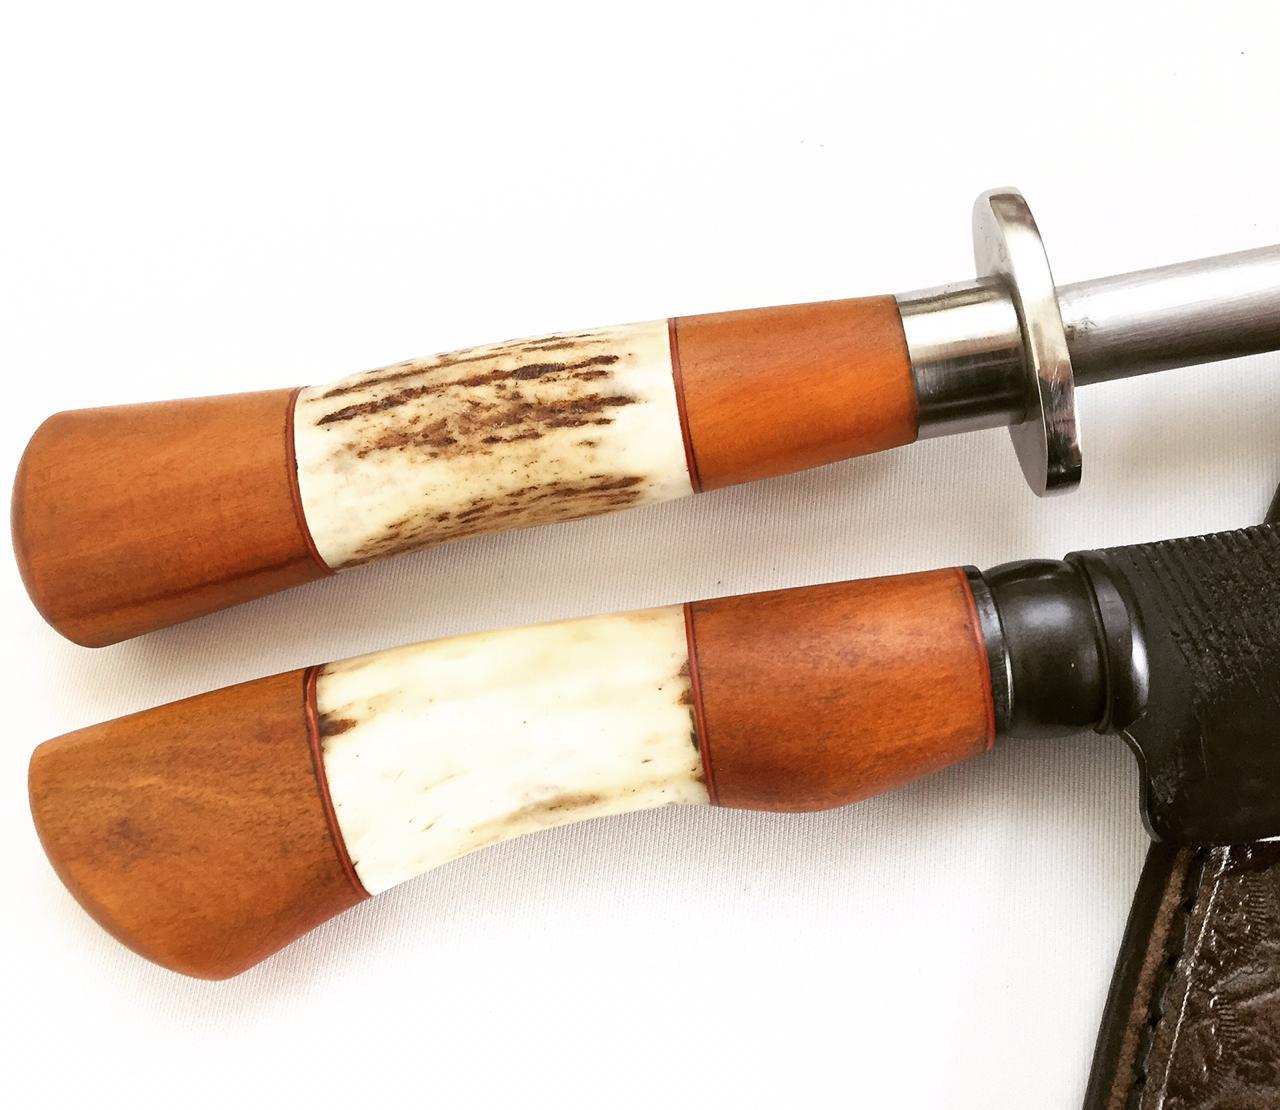 Conjunto artesanal forjado faca de lima e chaira